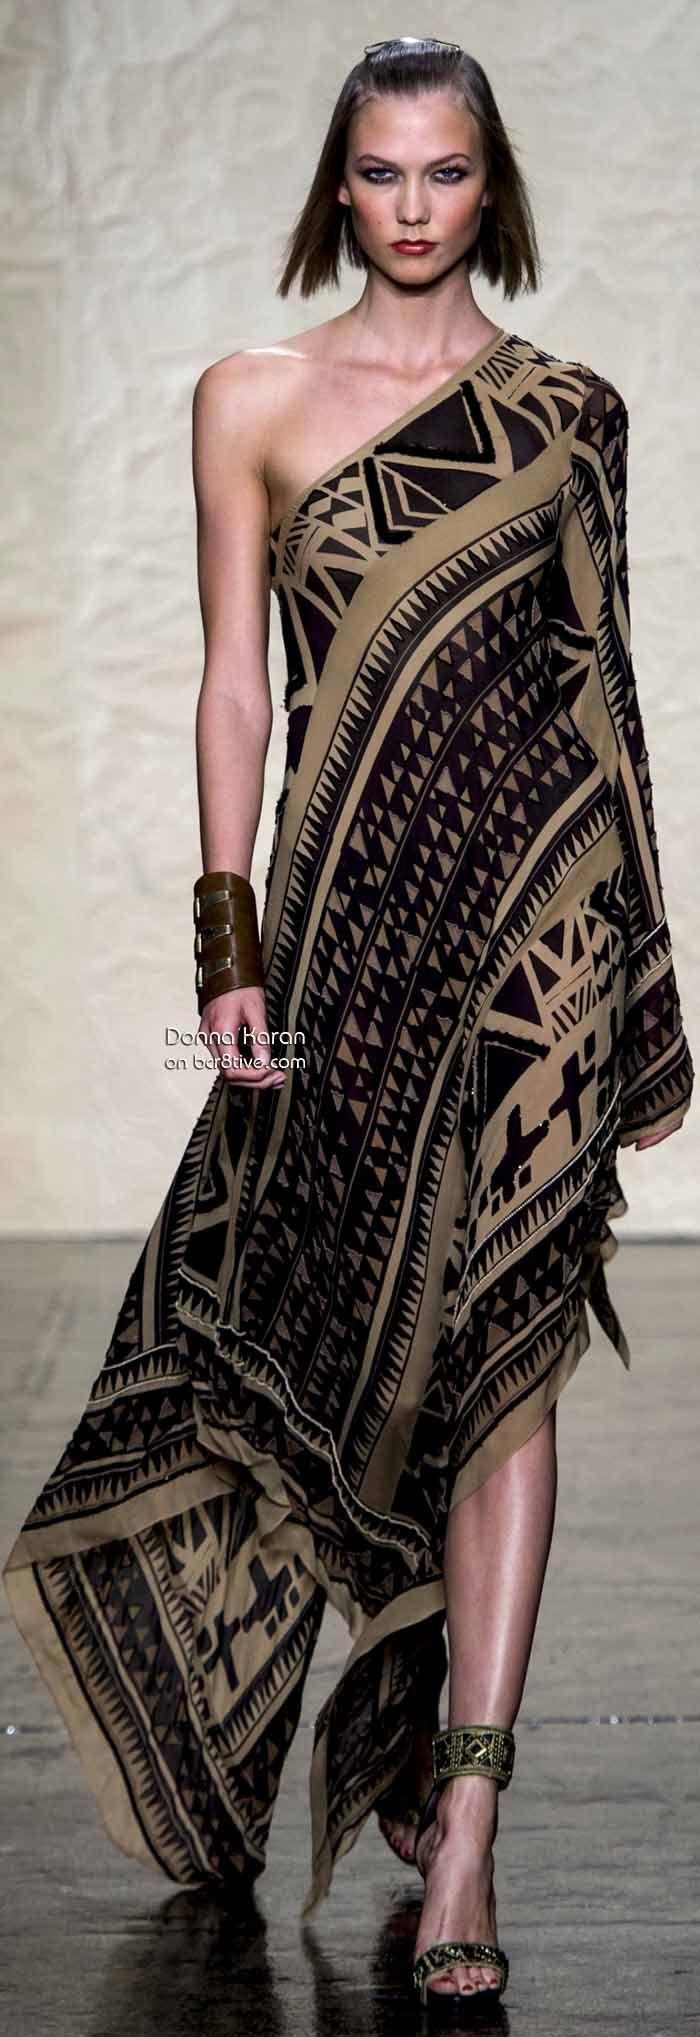 Donna Karan Spring 2014 New York Fashion Week. Patio parties. TG